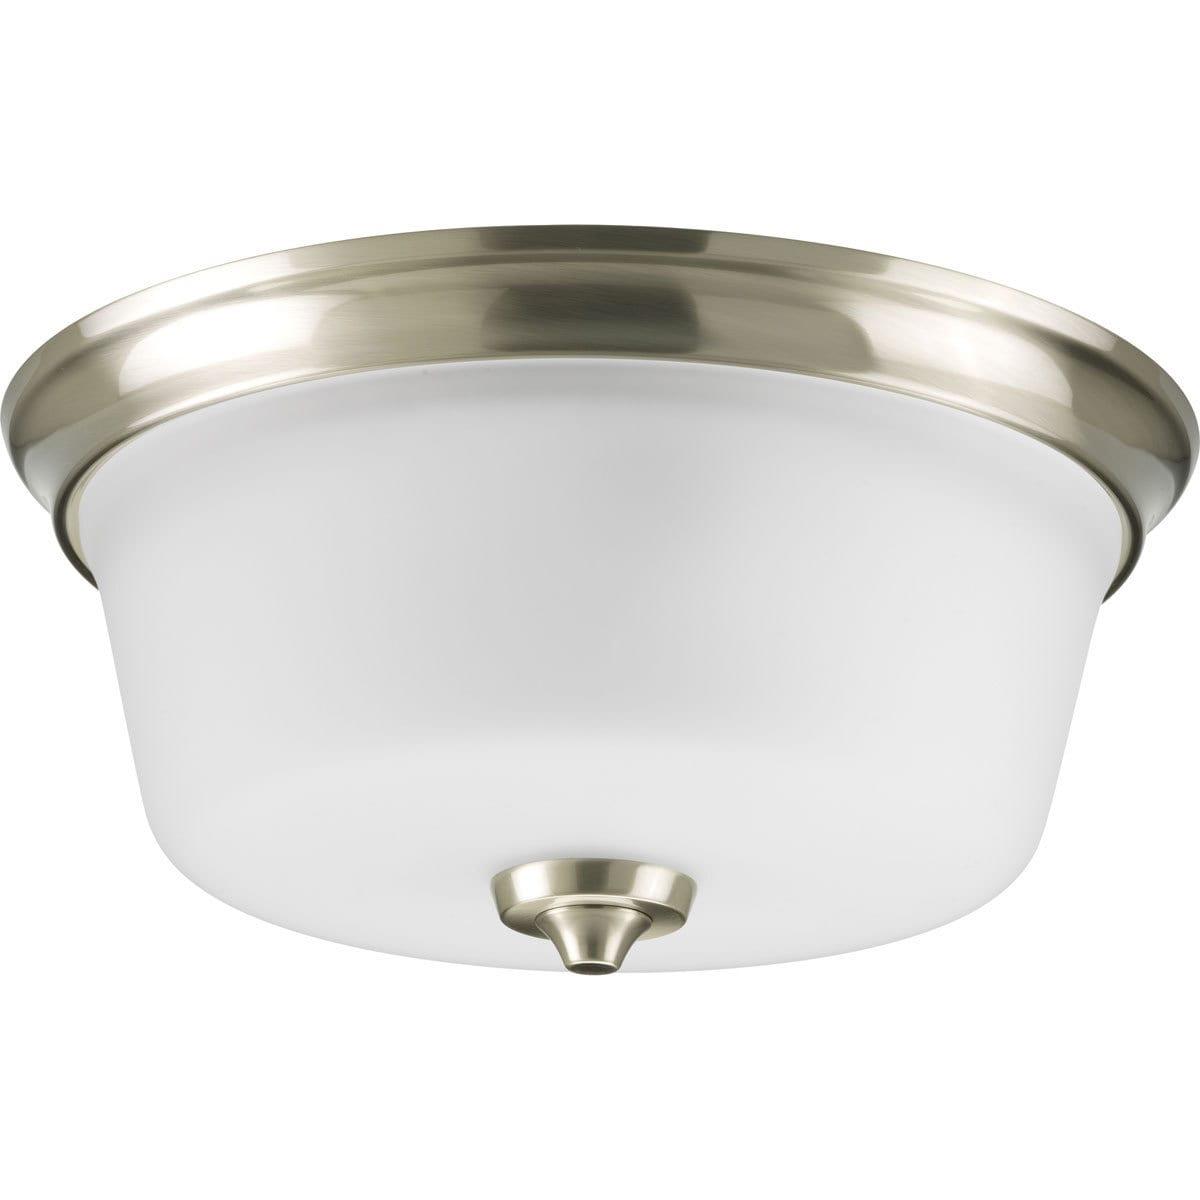 Progress Lighting Silvertone 2-light Semi-flush Mount Fix...